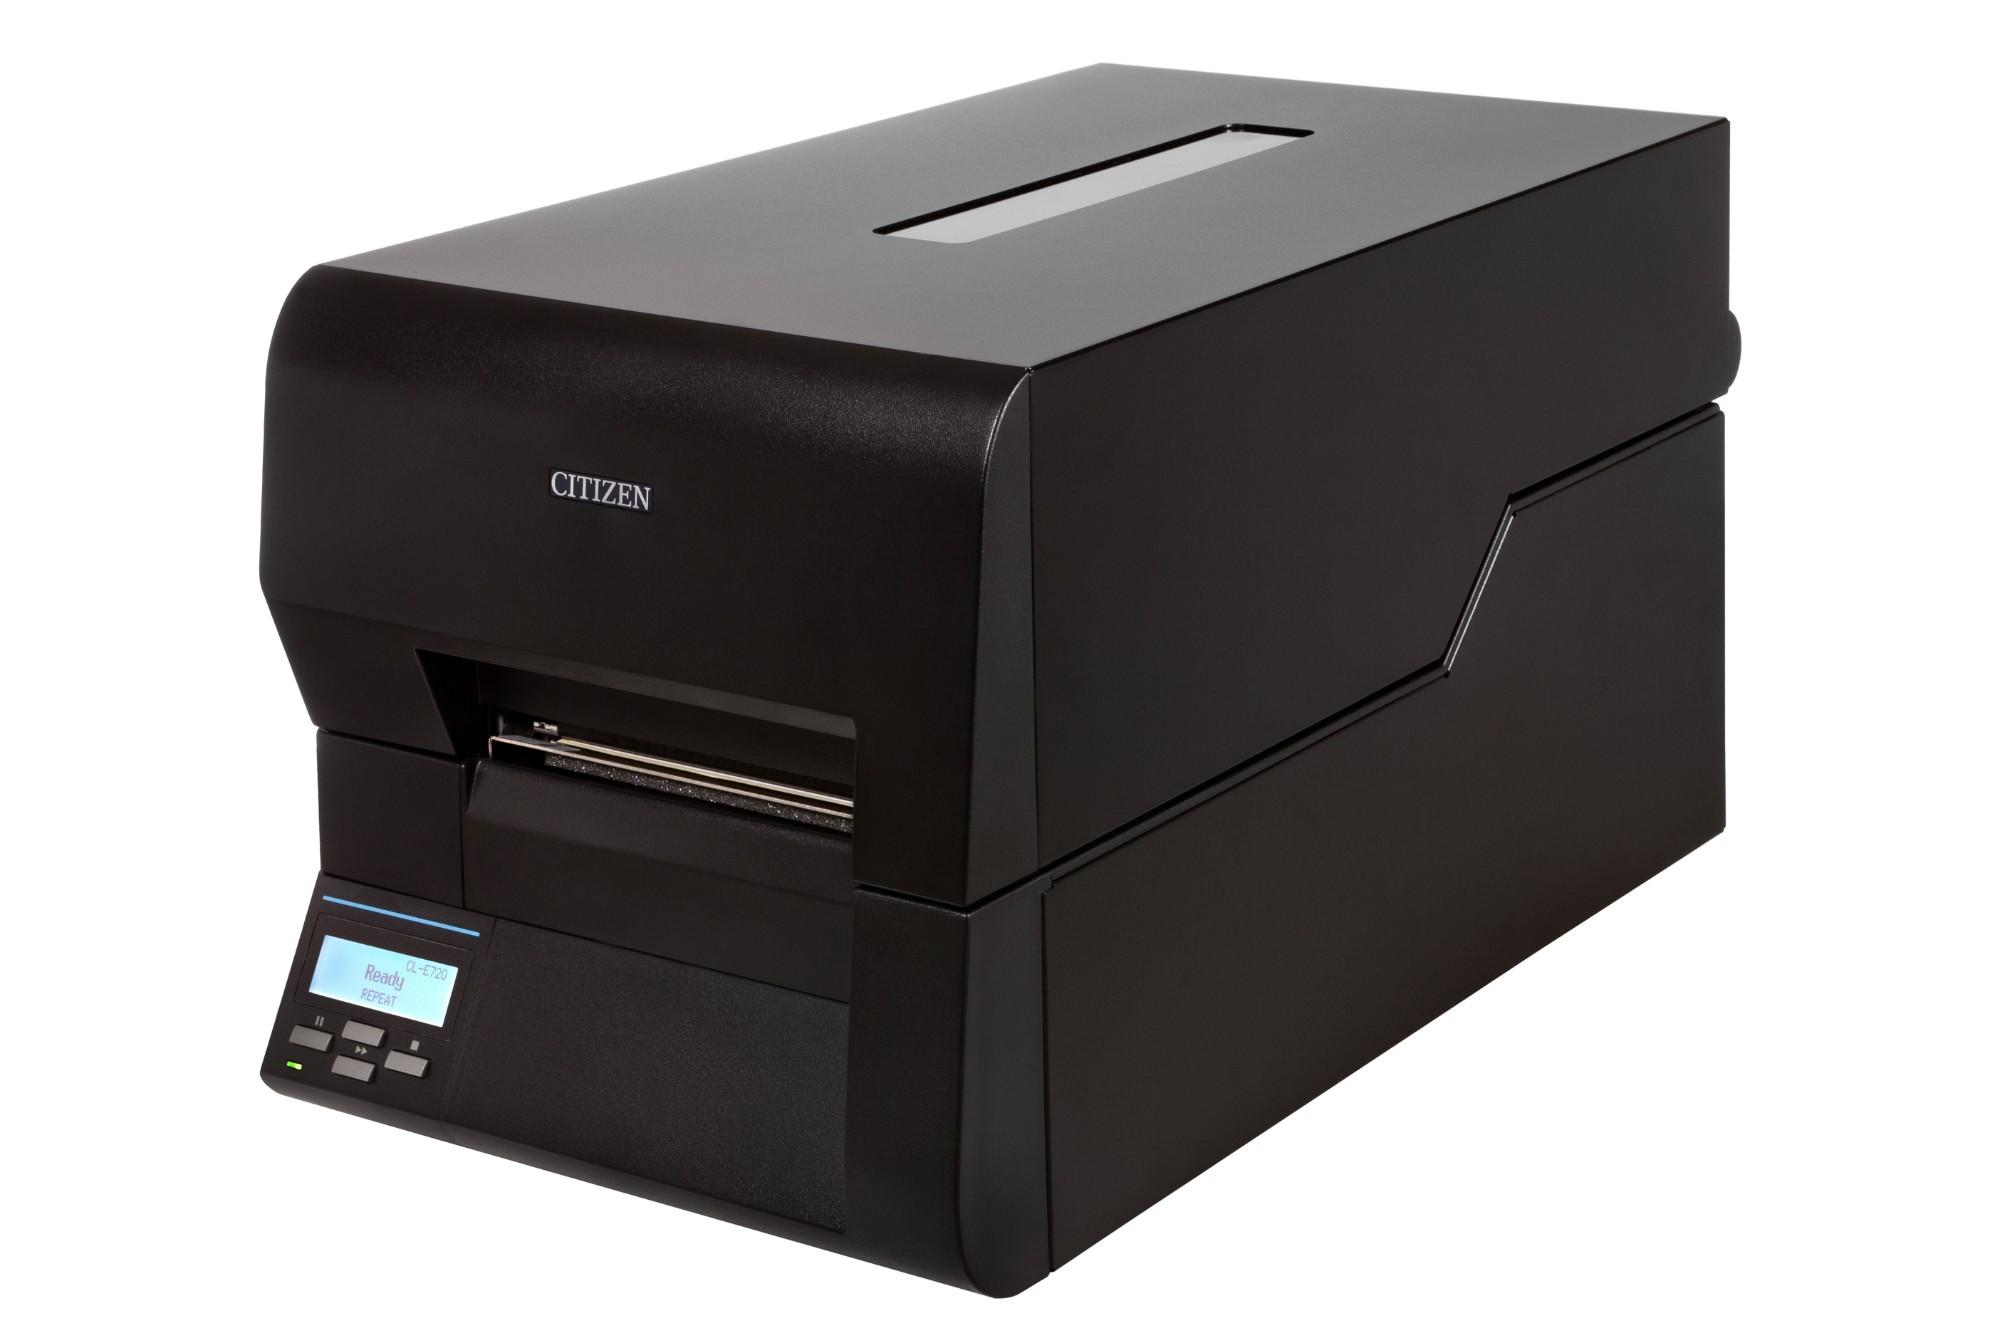 Citizen CL-E730 impresora de etiquetas Térmica directa / transferencia térmica 300 x 300 DPI Alámbrico